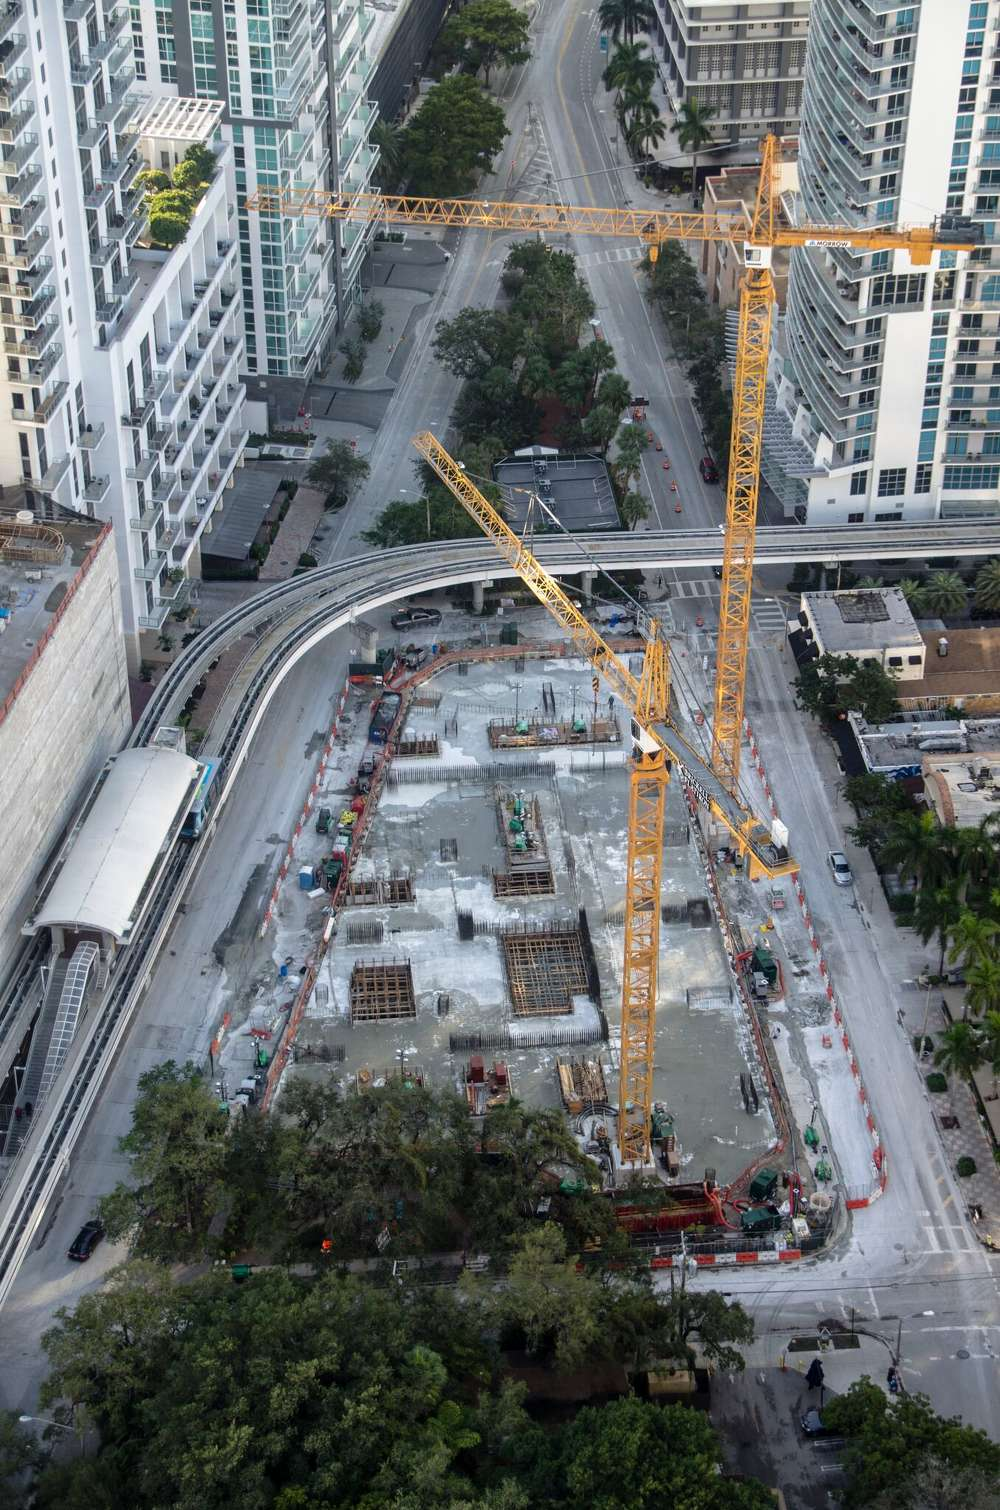 Concrete foundation pour in downtown Miami.